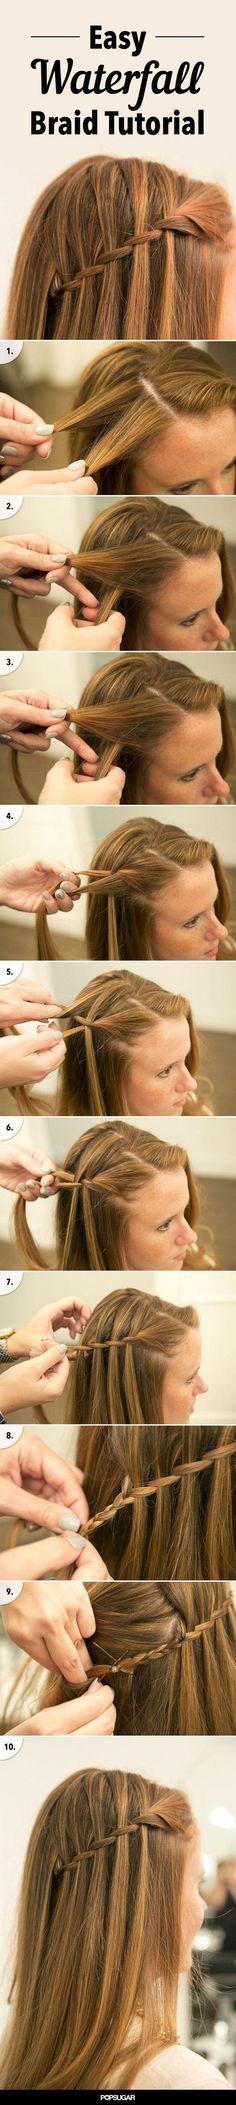 hair diy 7 Easy hair DIYs to try this weekend (18 photos)